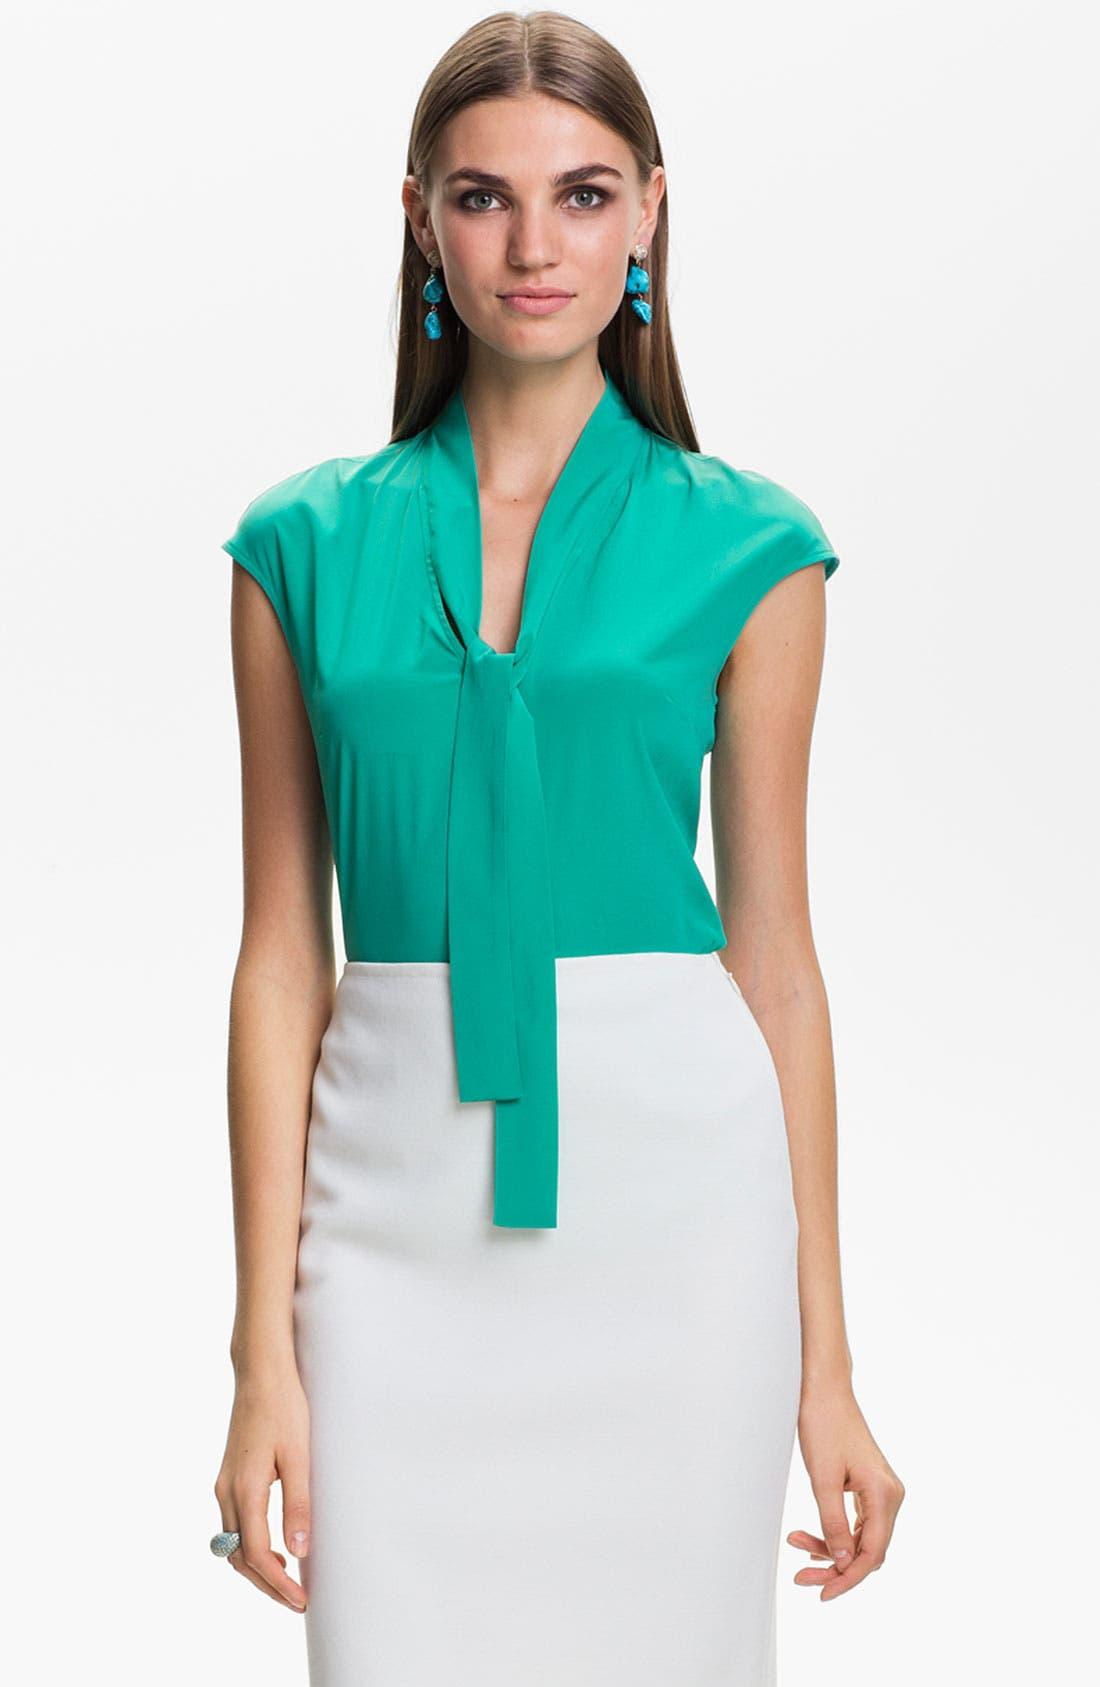 Main Image - St. John Collection Top & Skirt